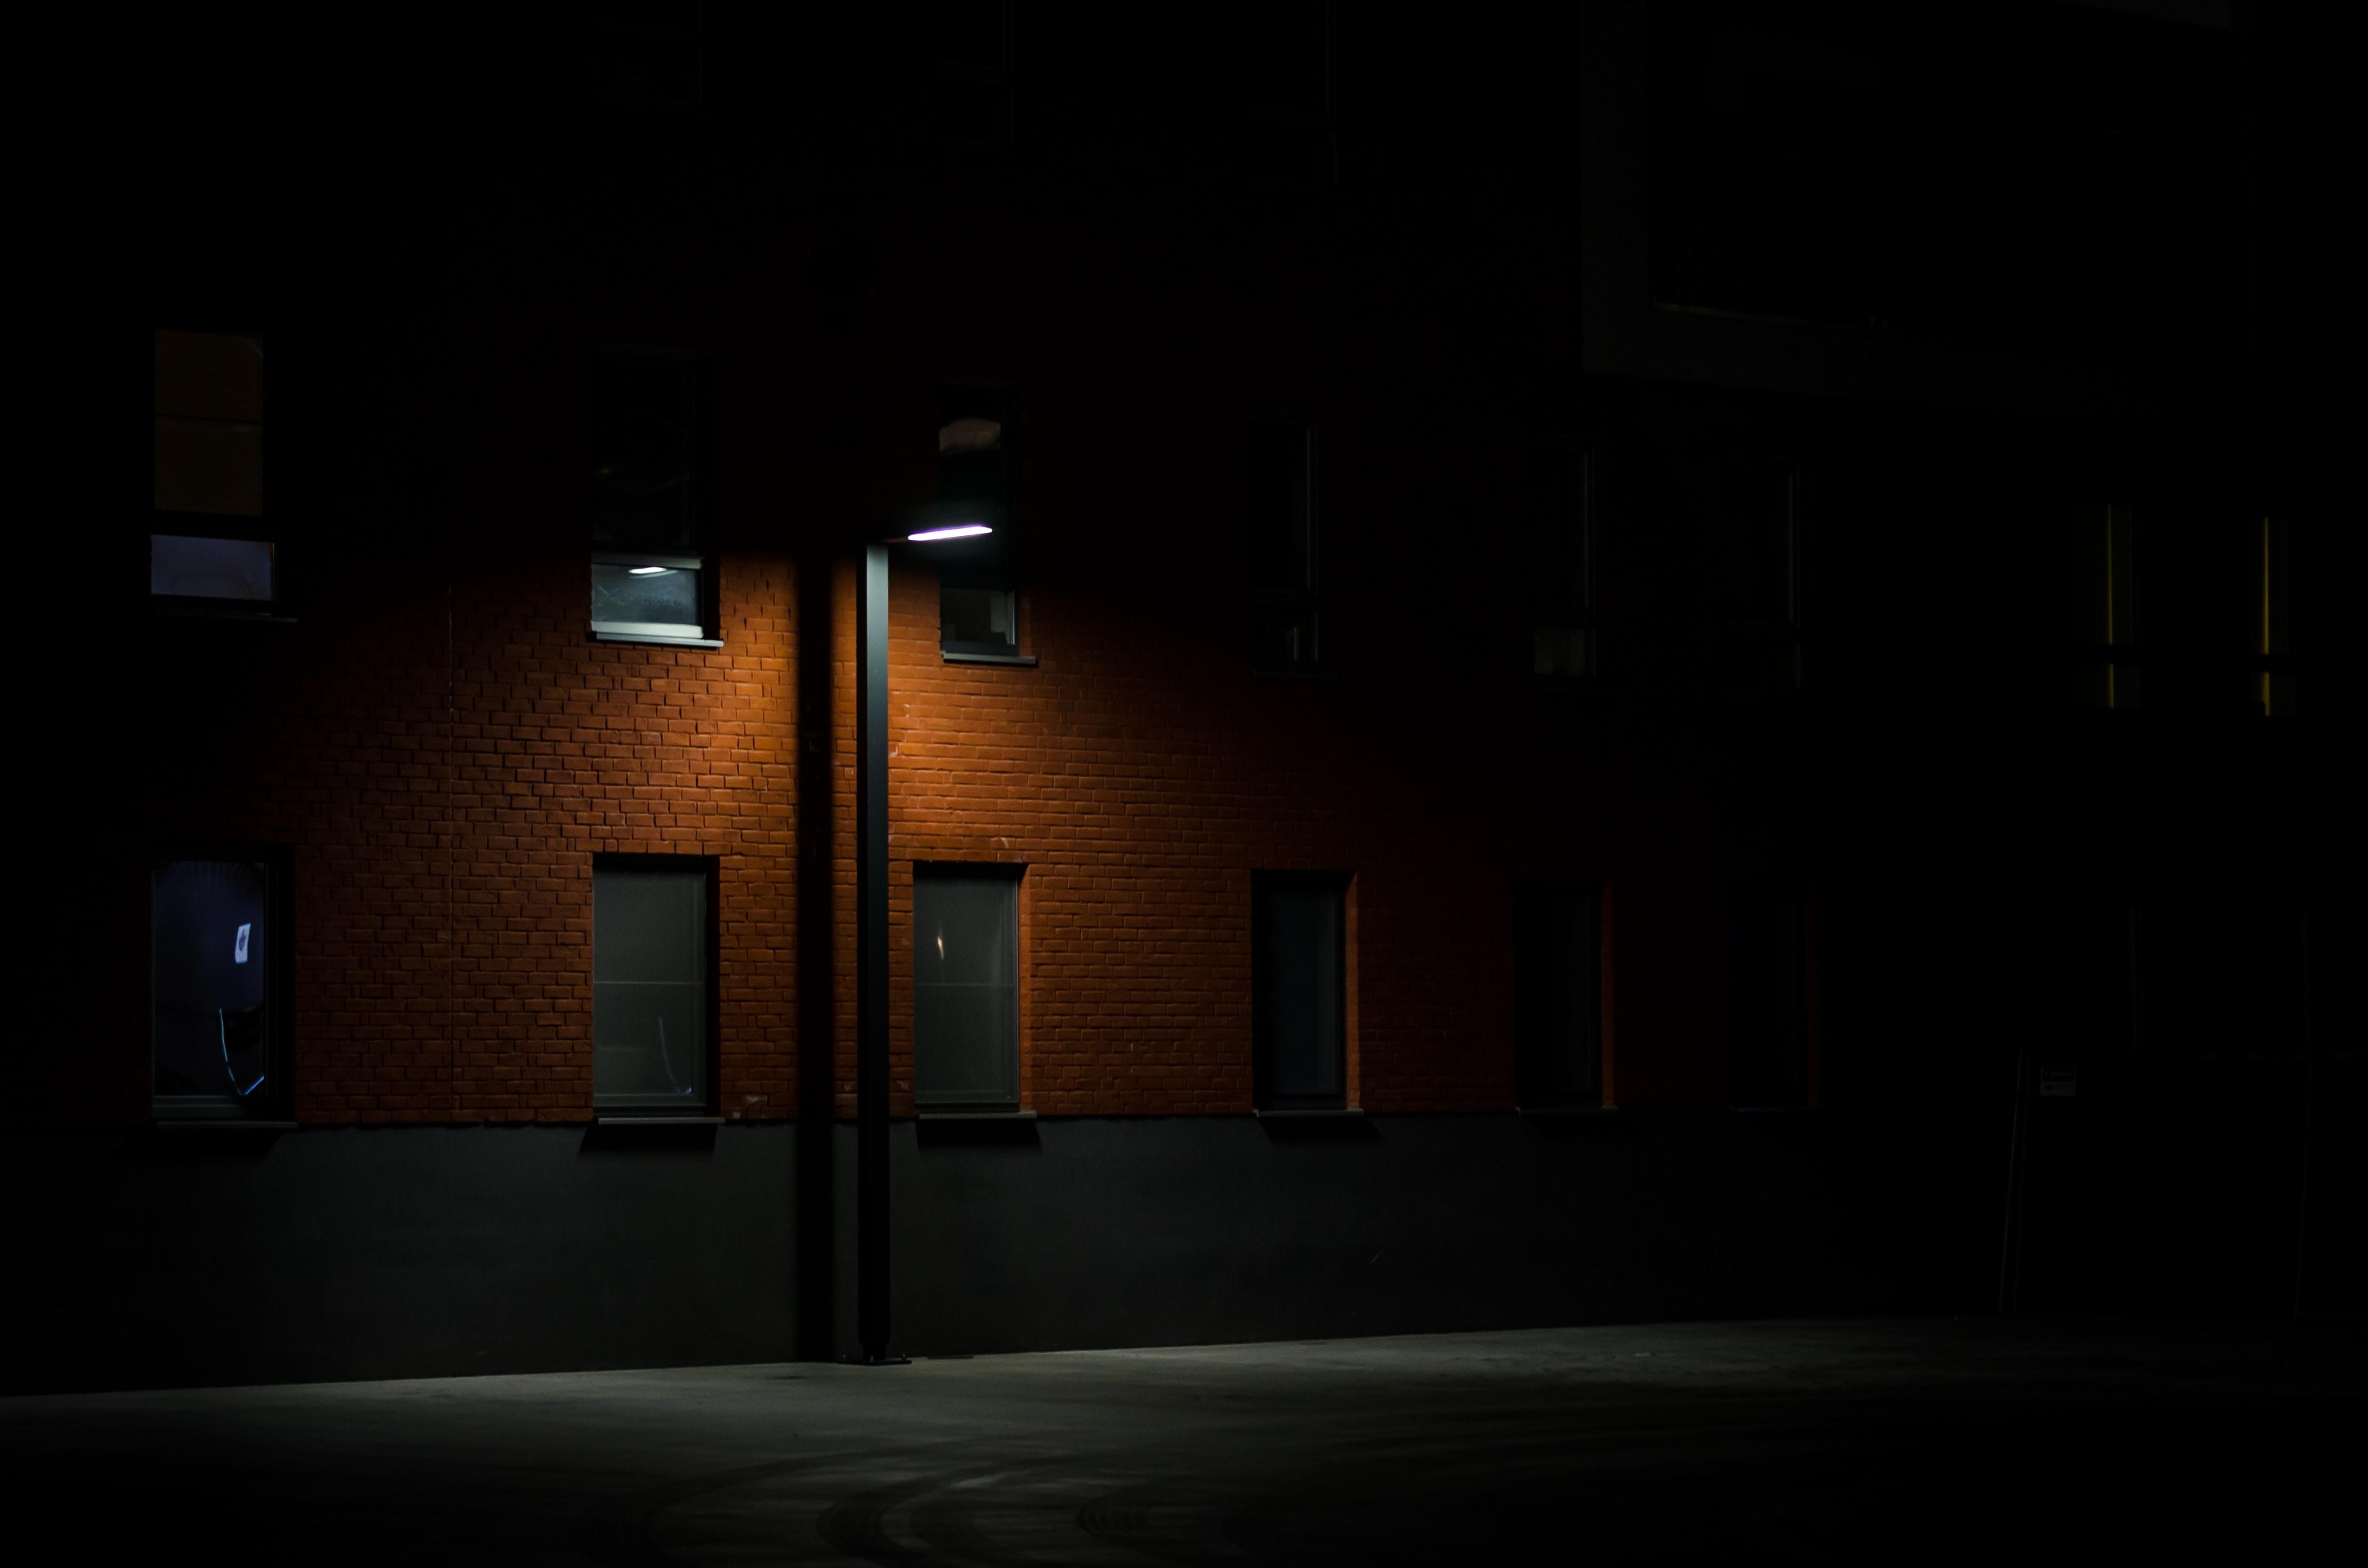 Free Unsplash photo from Jonas Verstuyft